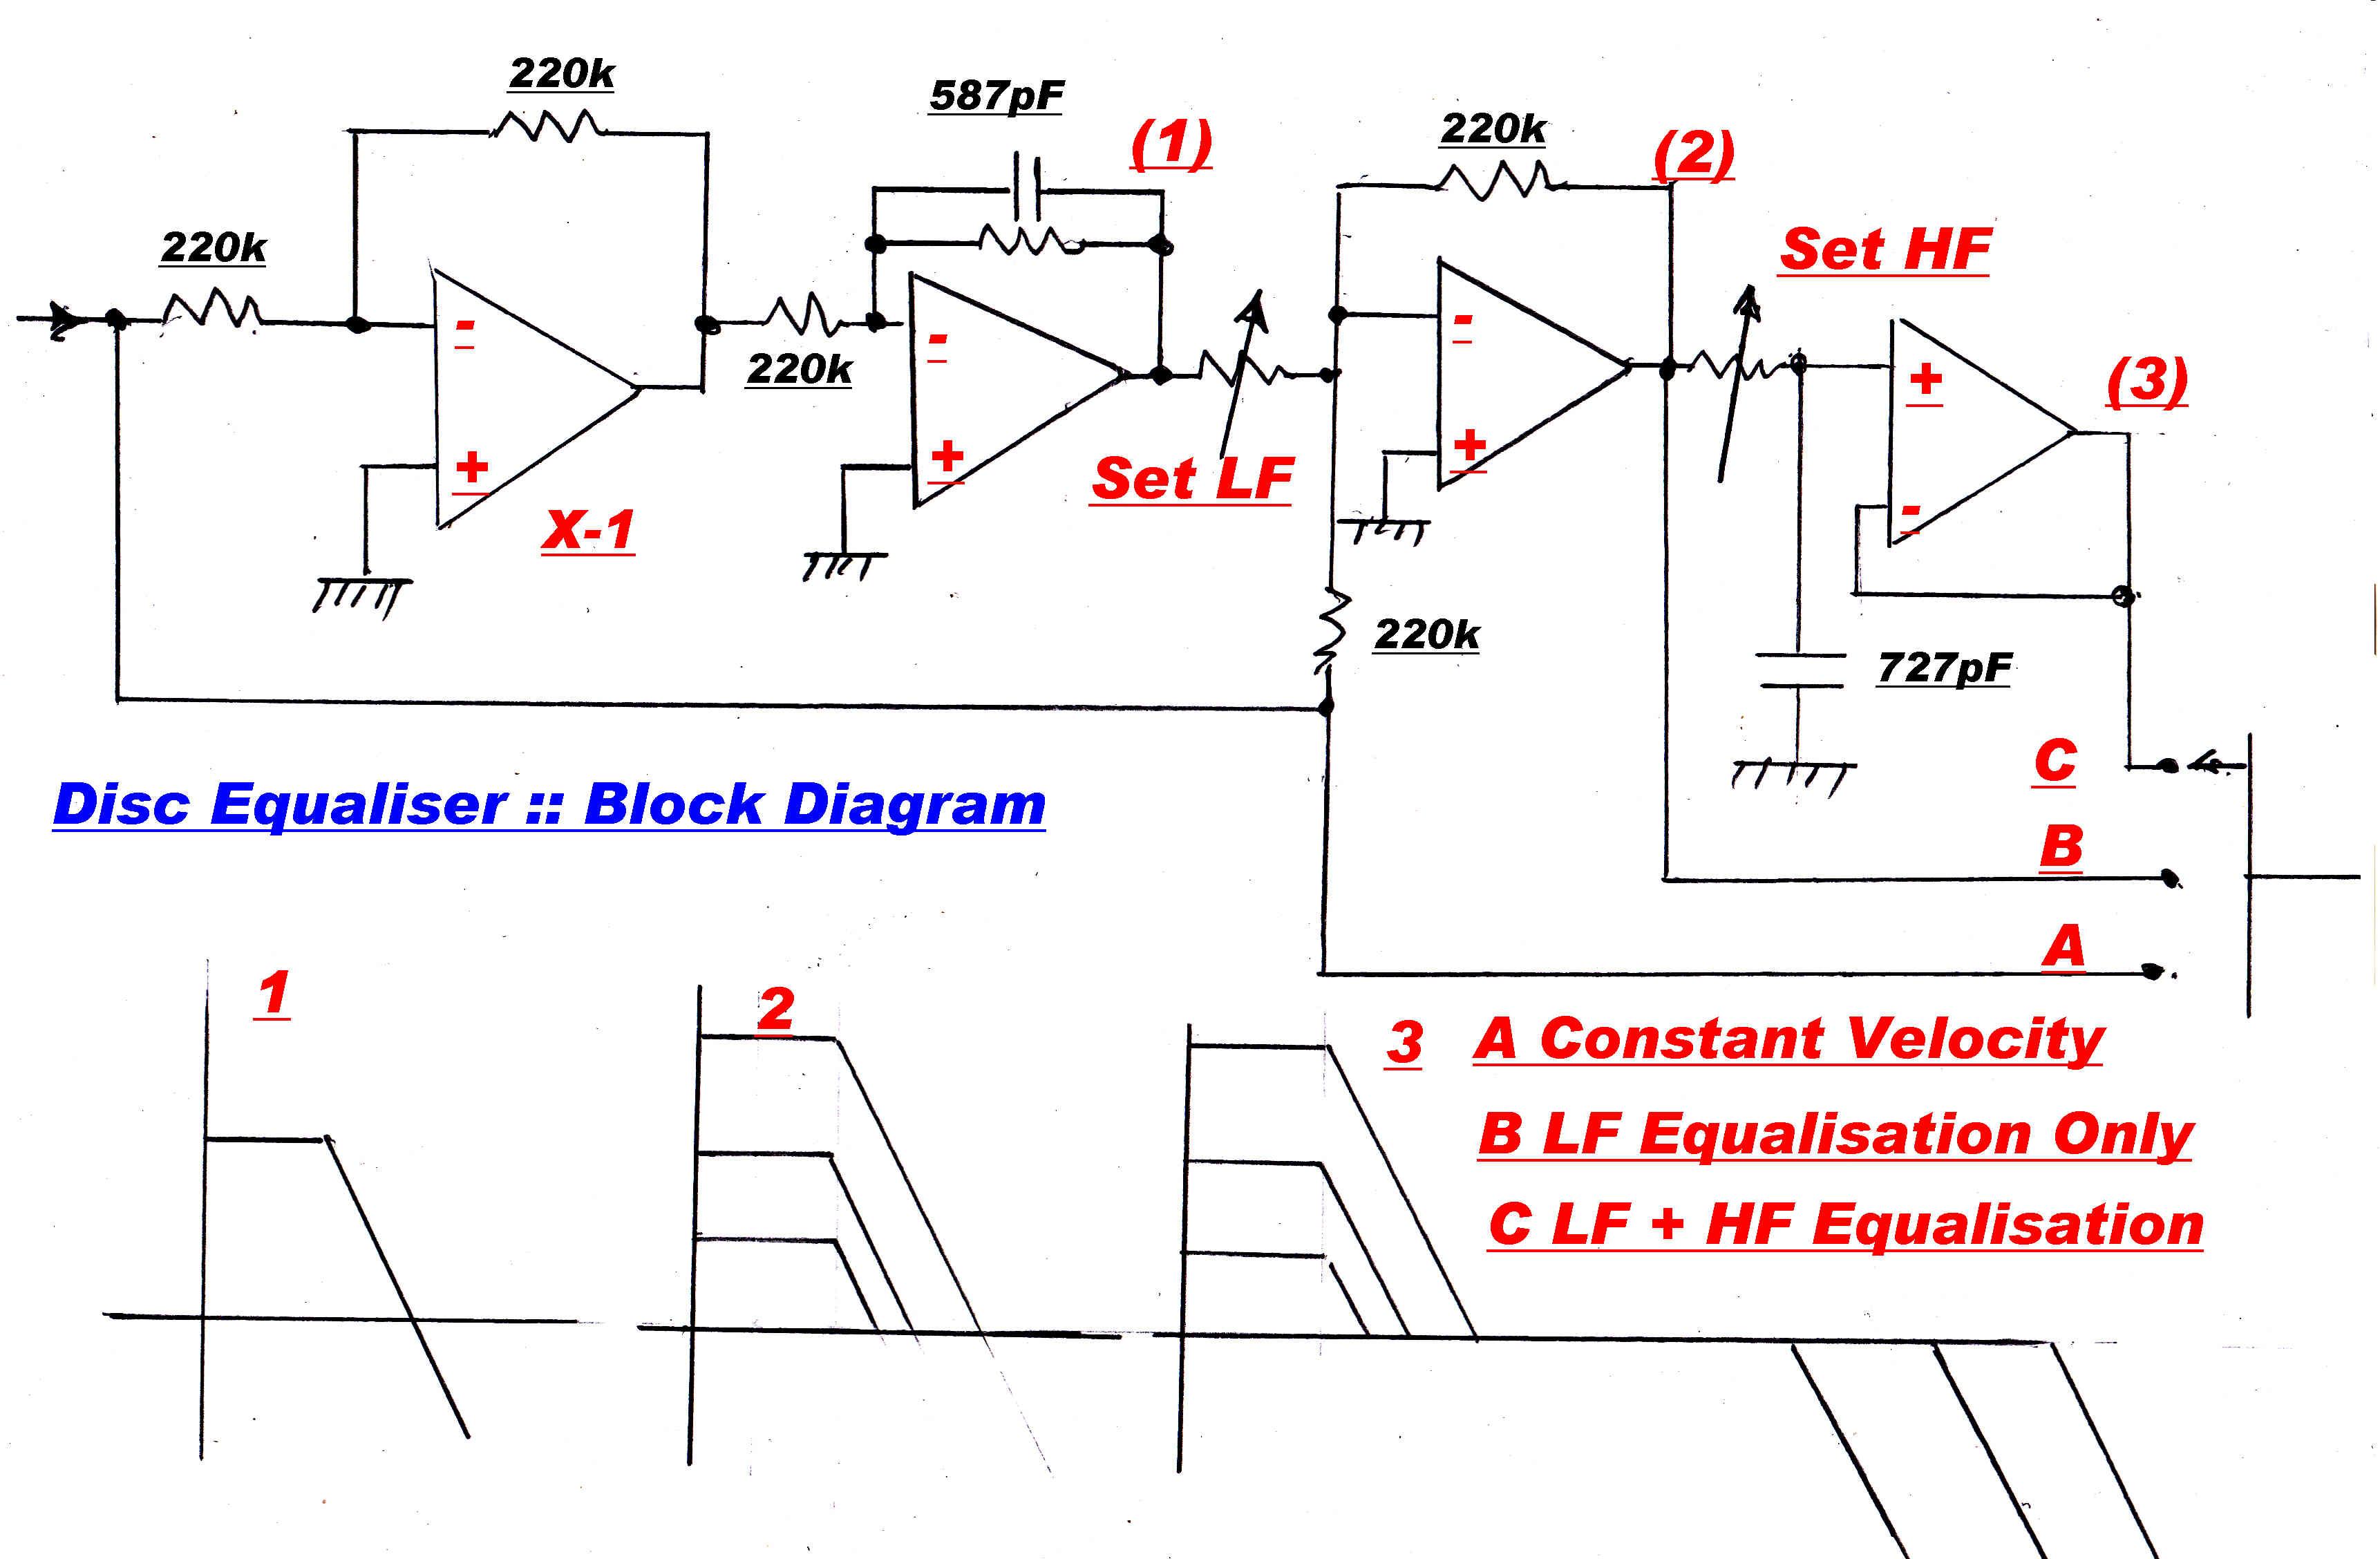 Oven Temperature Controller Circuit Diagram Tradeoficcom Wiring Voltage Controlled Oscillator Shuttle Track